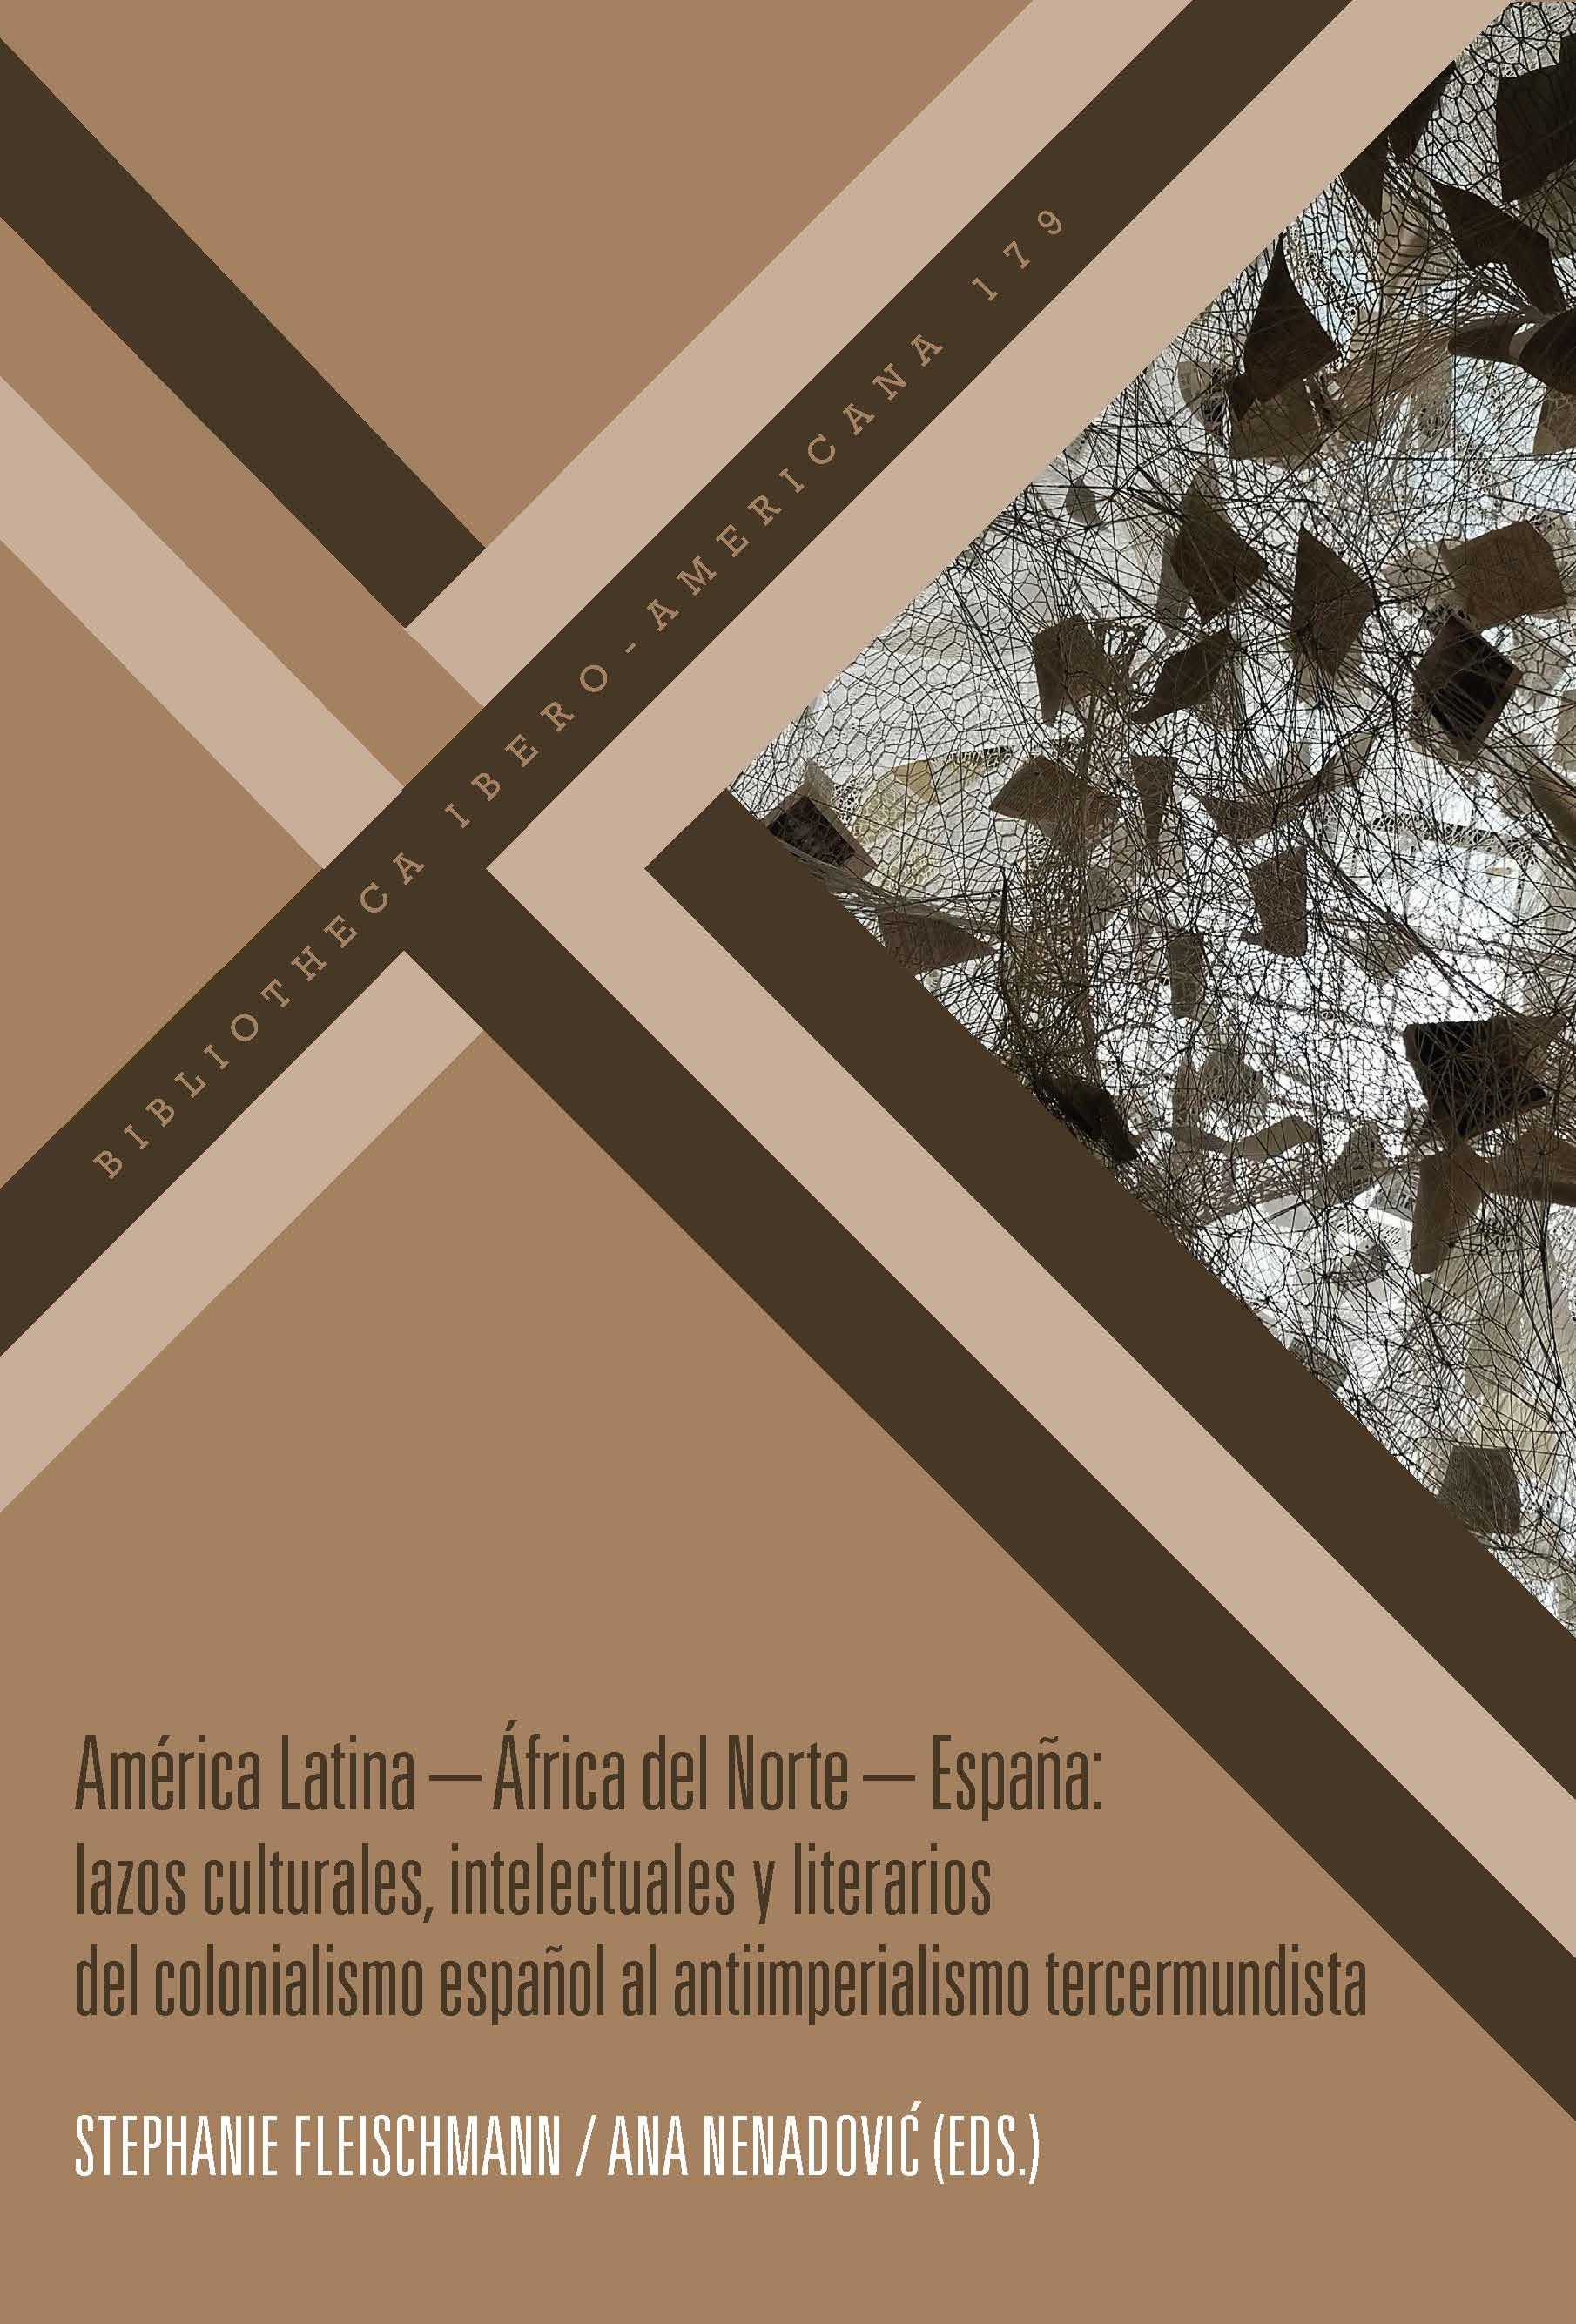 AMERICA LATINA  AFRICA DEL NORTE  ESPAÑA